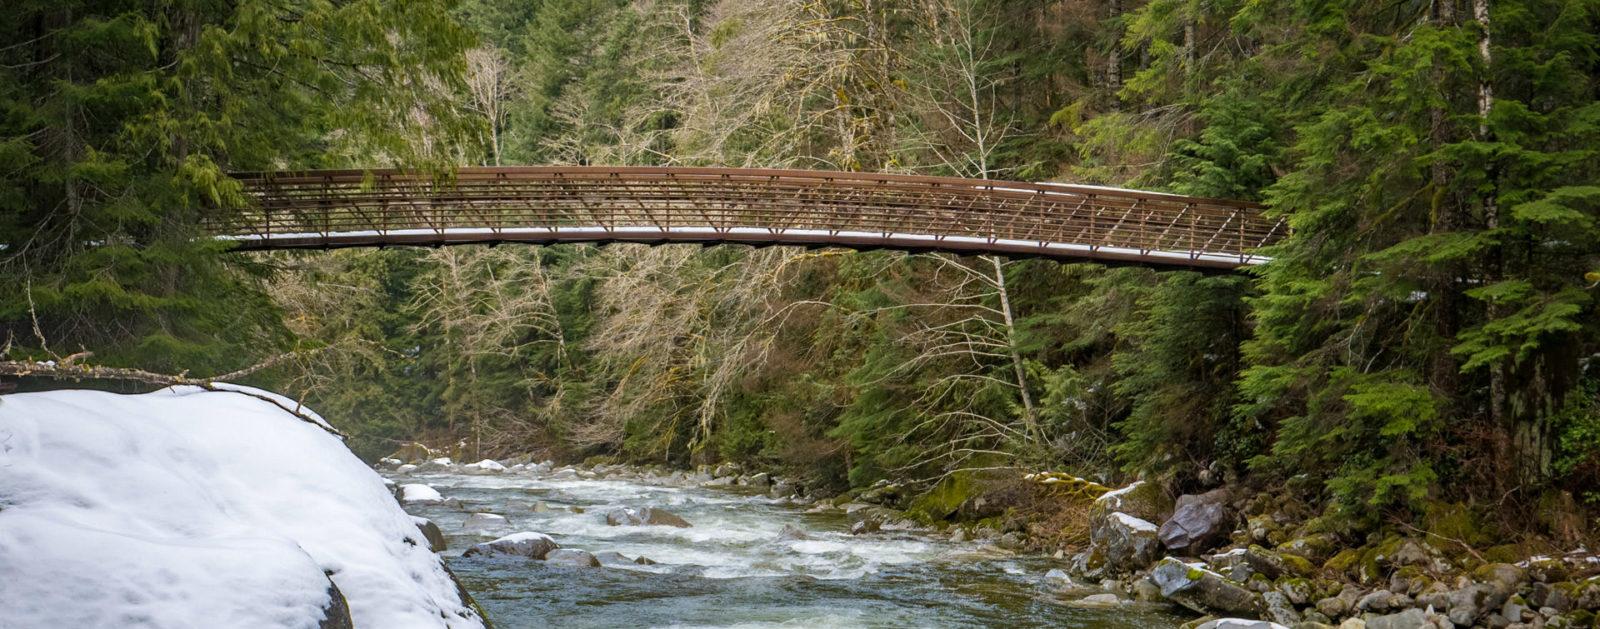 Middle Fork Snoqualmie River Bridge   Photo by Monty VanderBilt